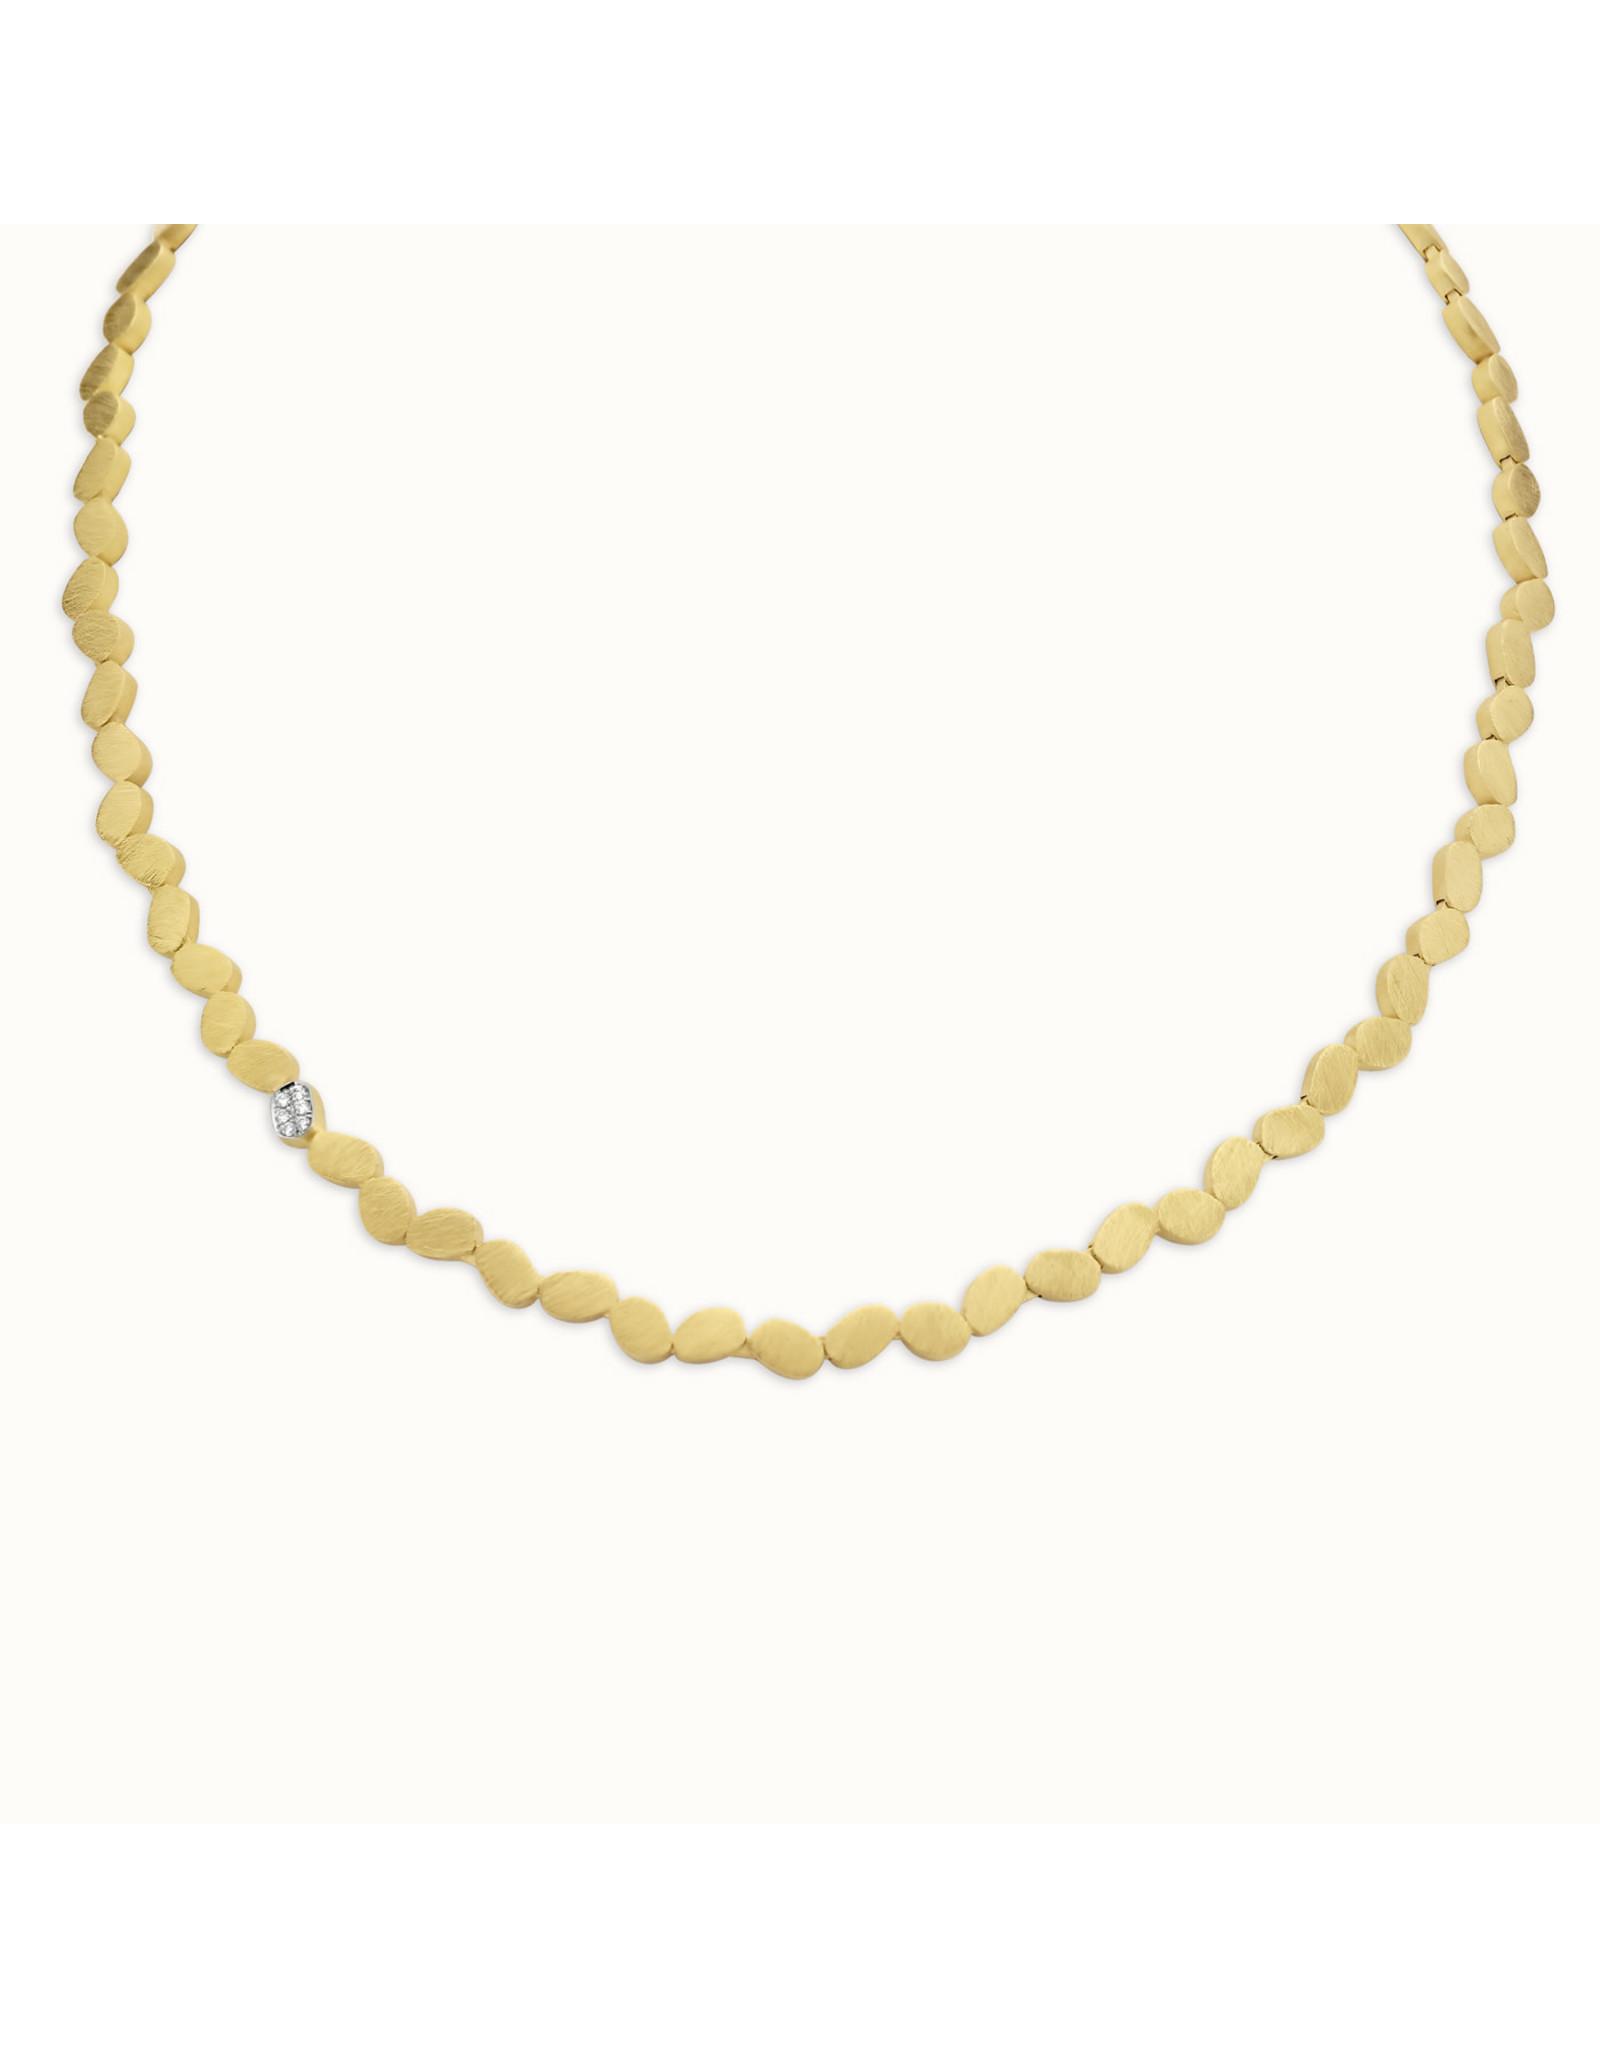 Femme adoree Collier Geel Goud 18kt 03C0301 Diamant 6pt